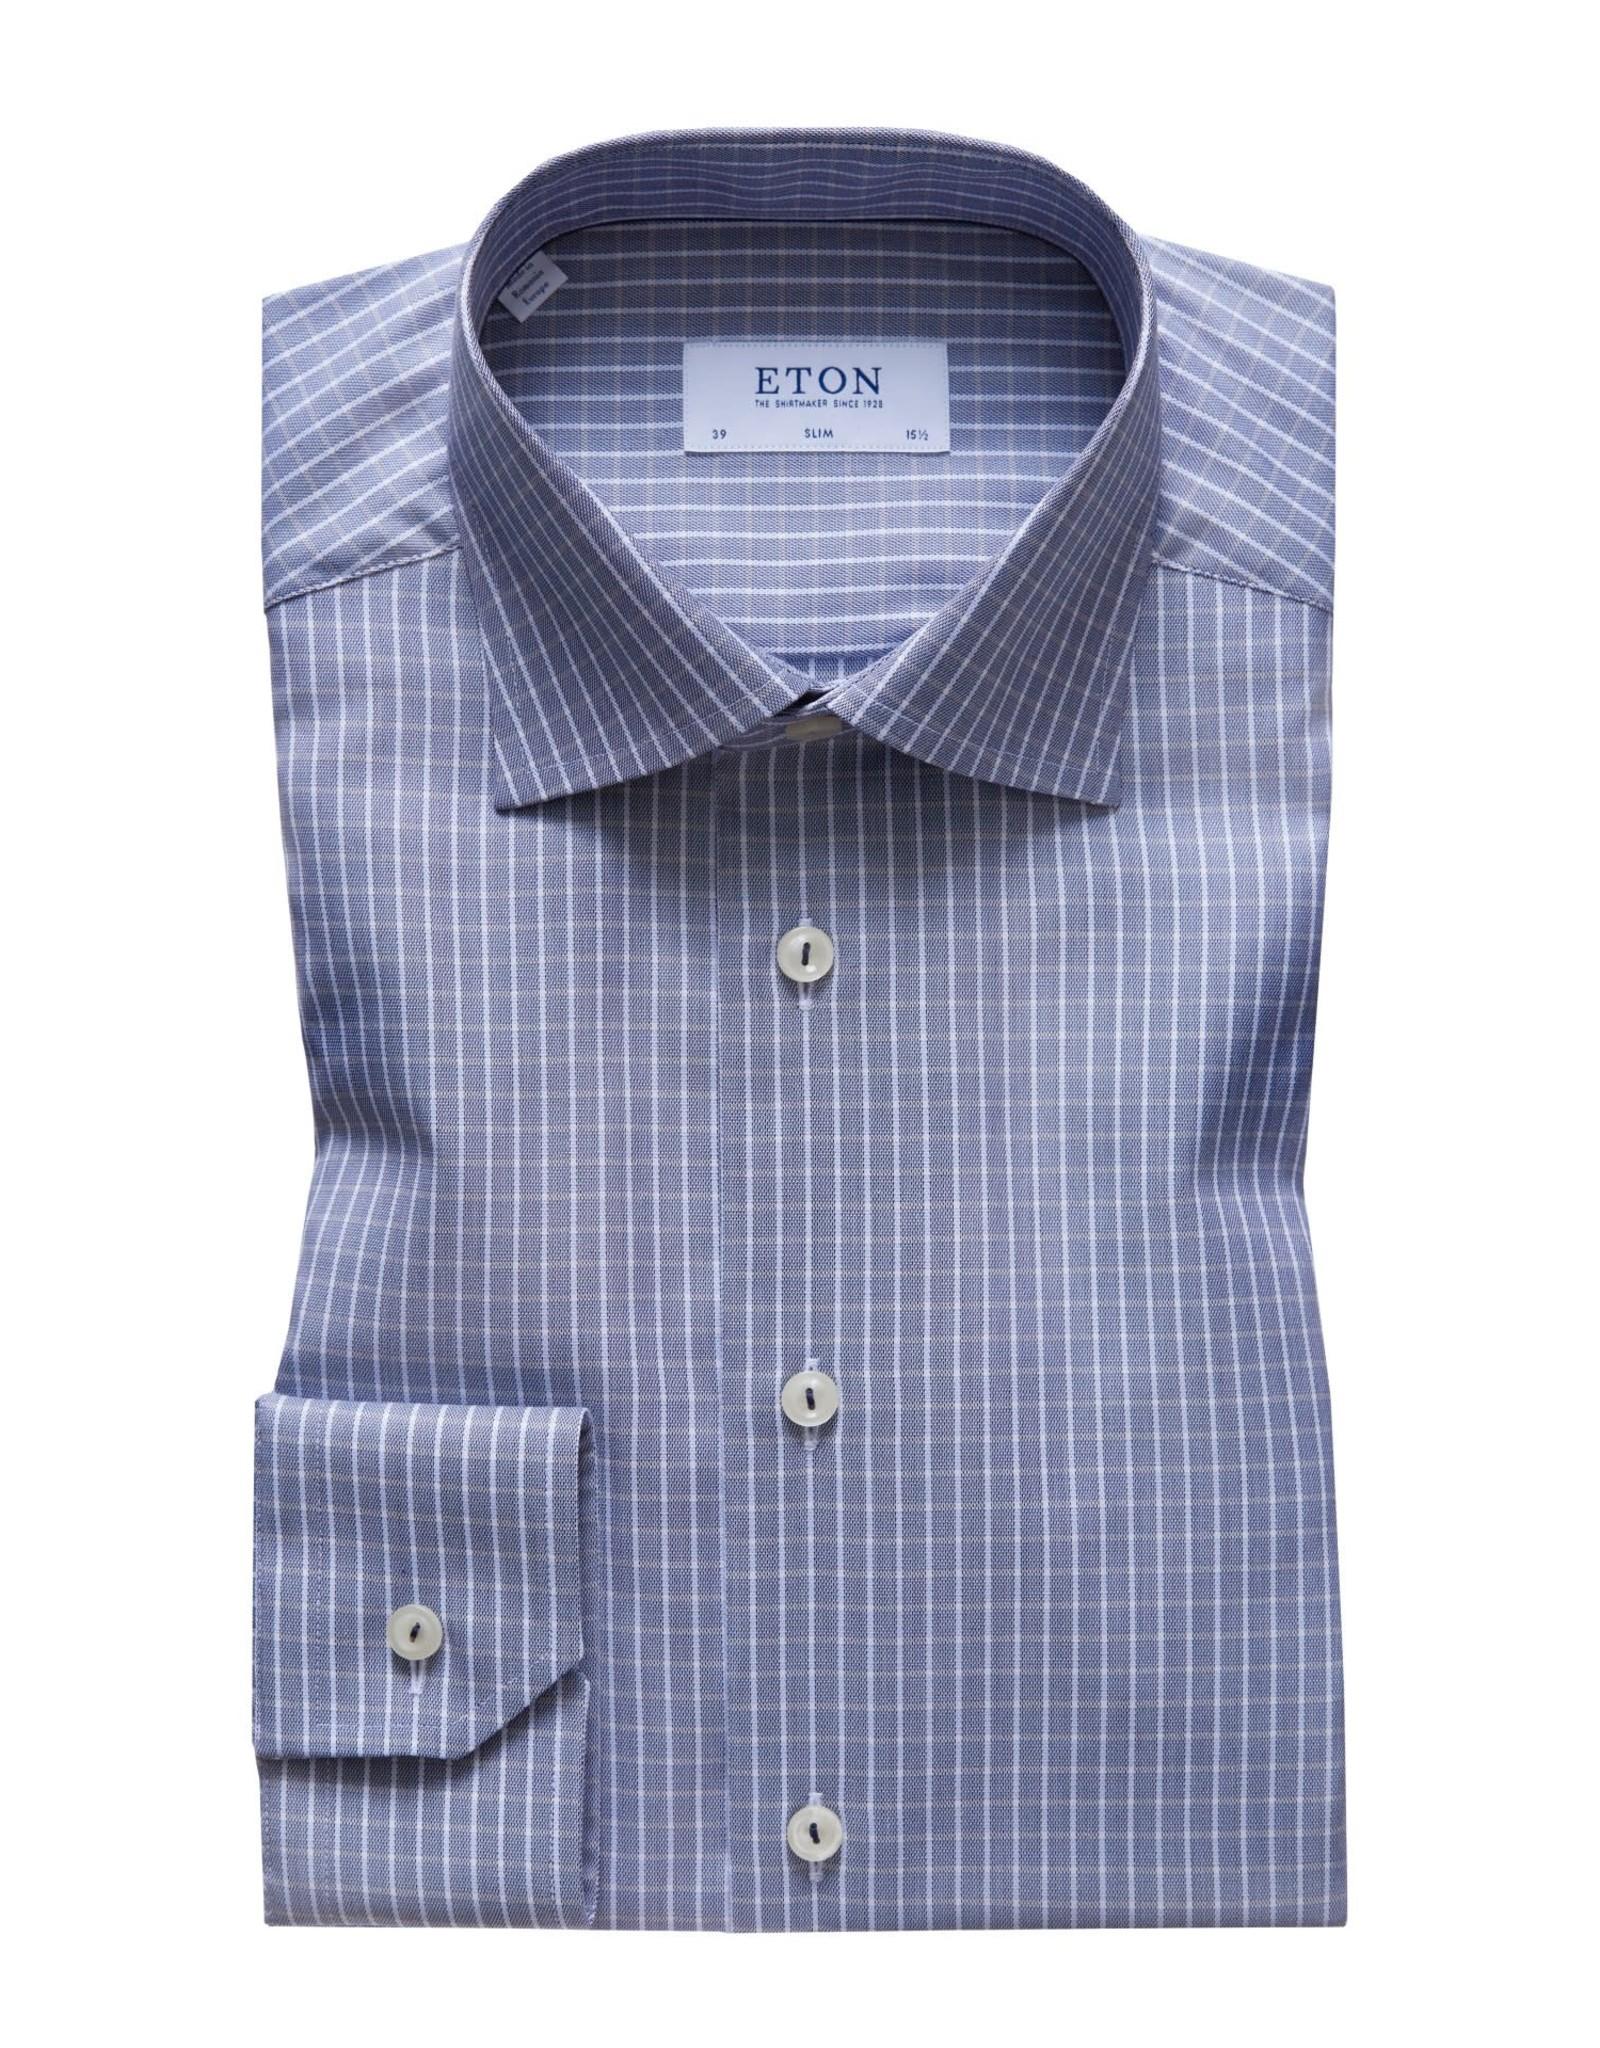 Eton Eton hemd grijs slim 3398-79607/29